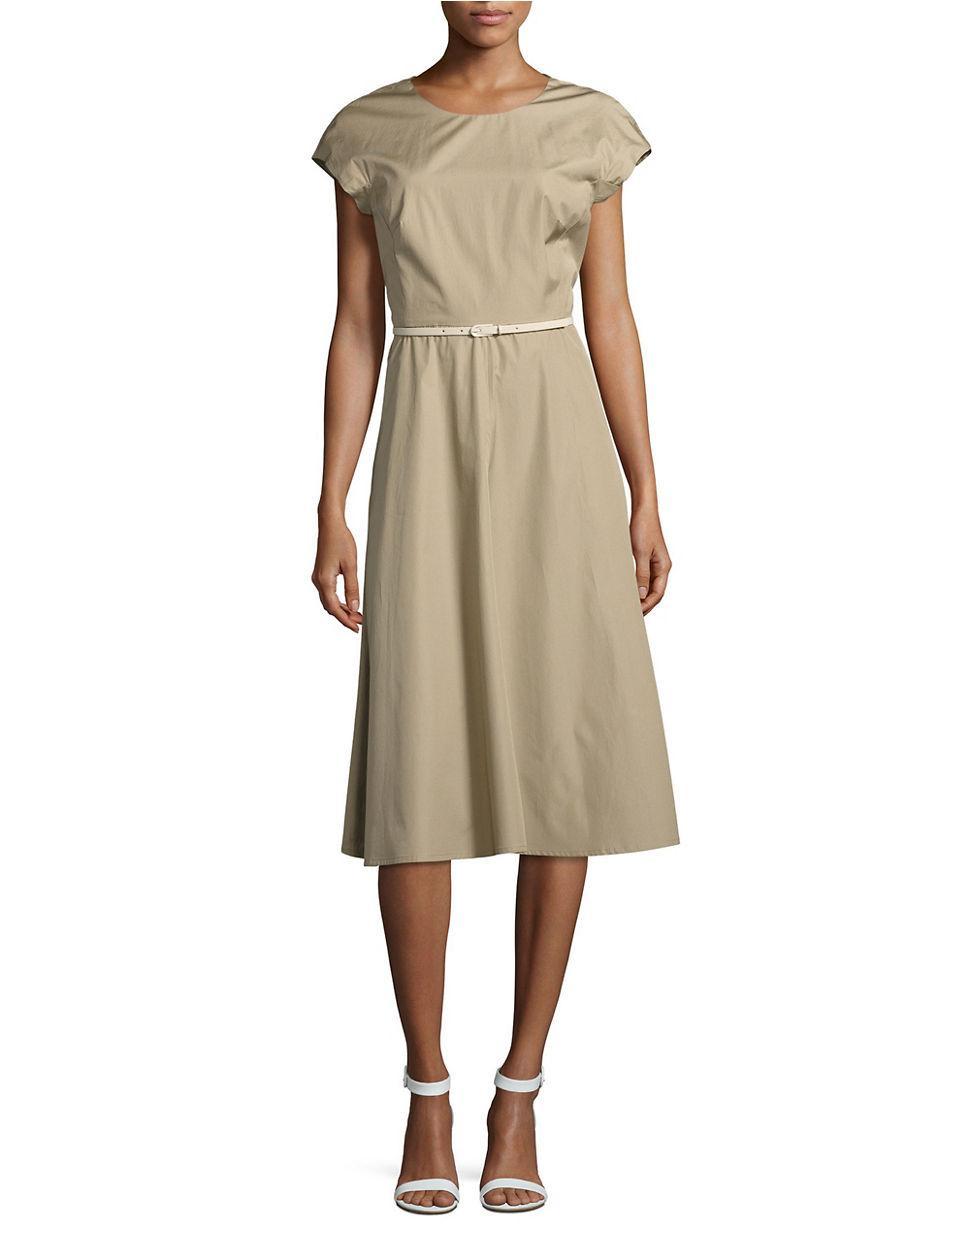 max mara studio calate solid roundneck dress in brown lyst. Black Bedroom Furniture Sets. Home Design Ideas